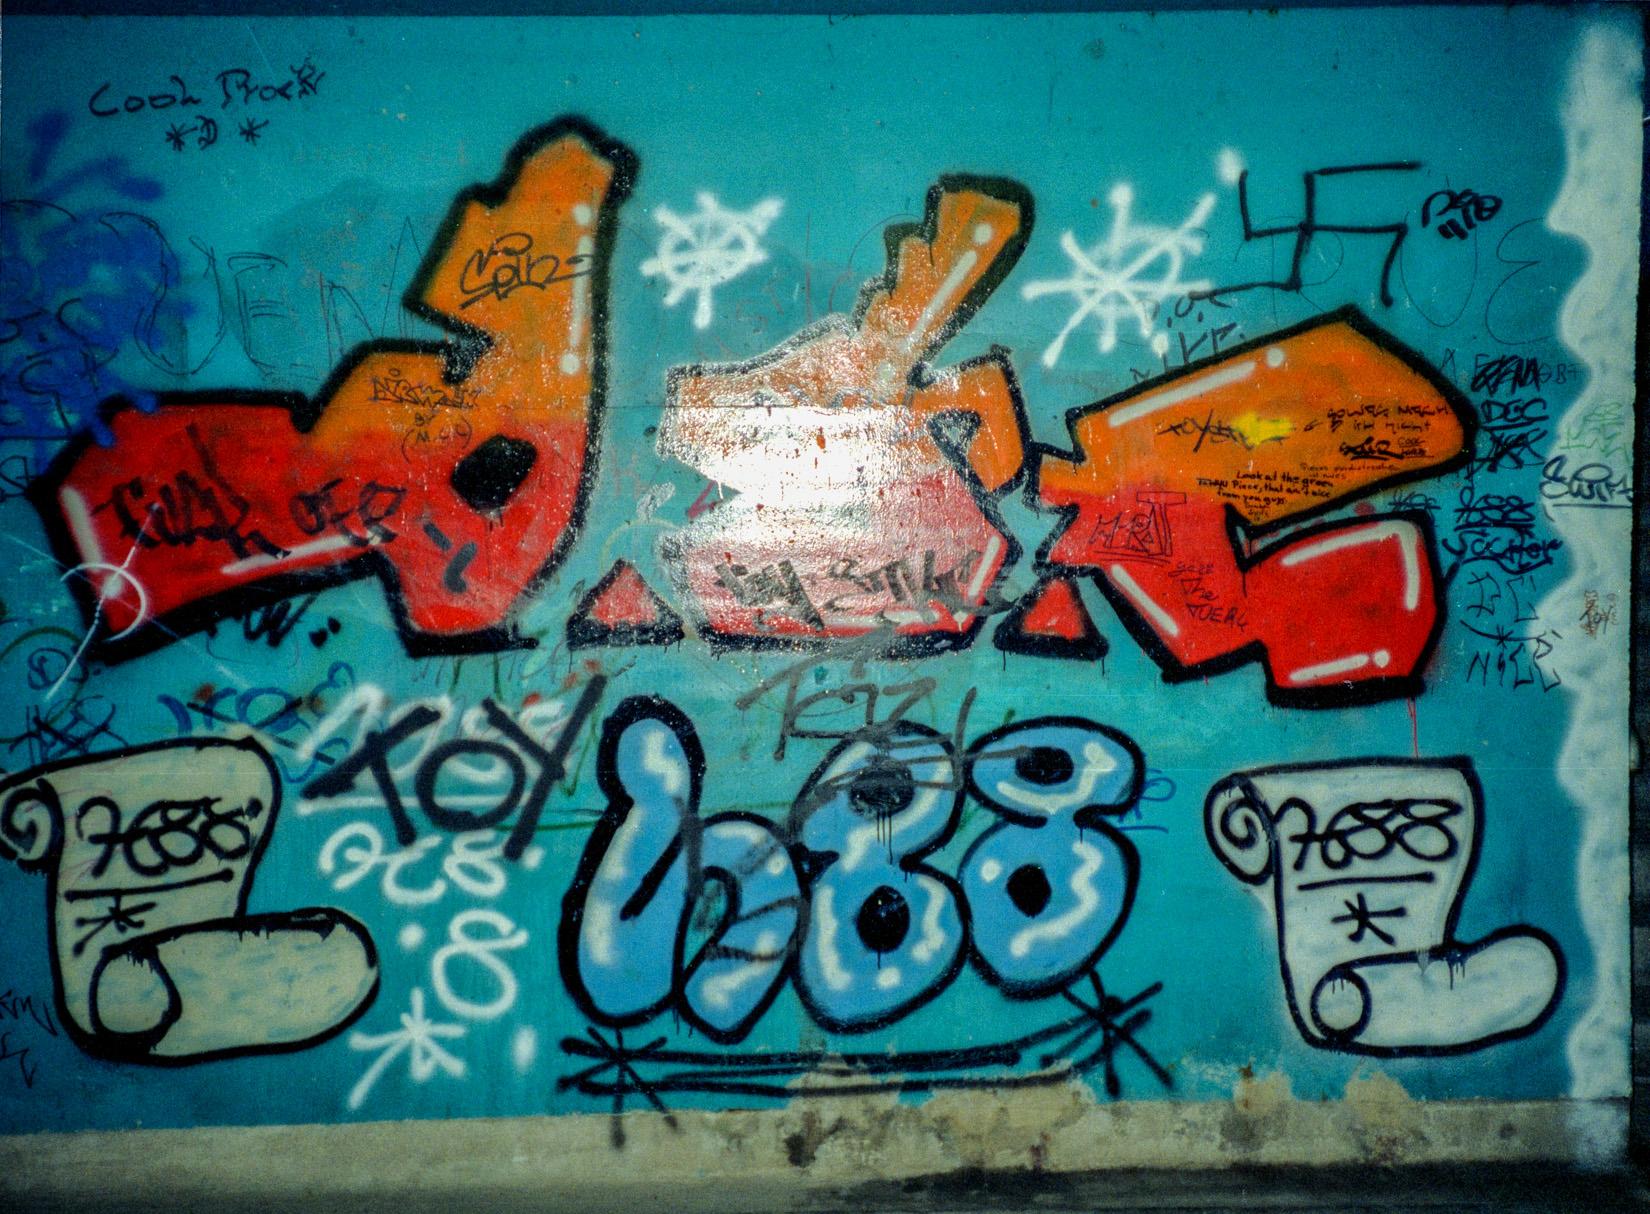 Frankfurt_Graffiti_1988_1989_H88_FRC (1 von 25)